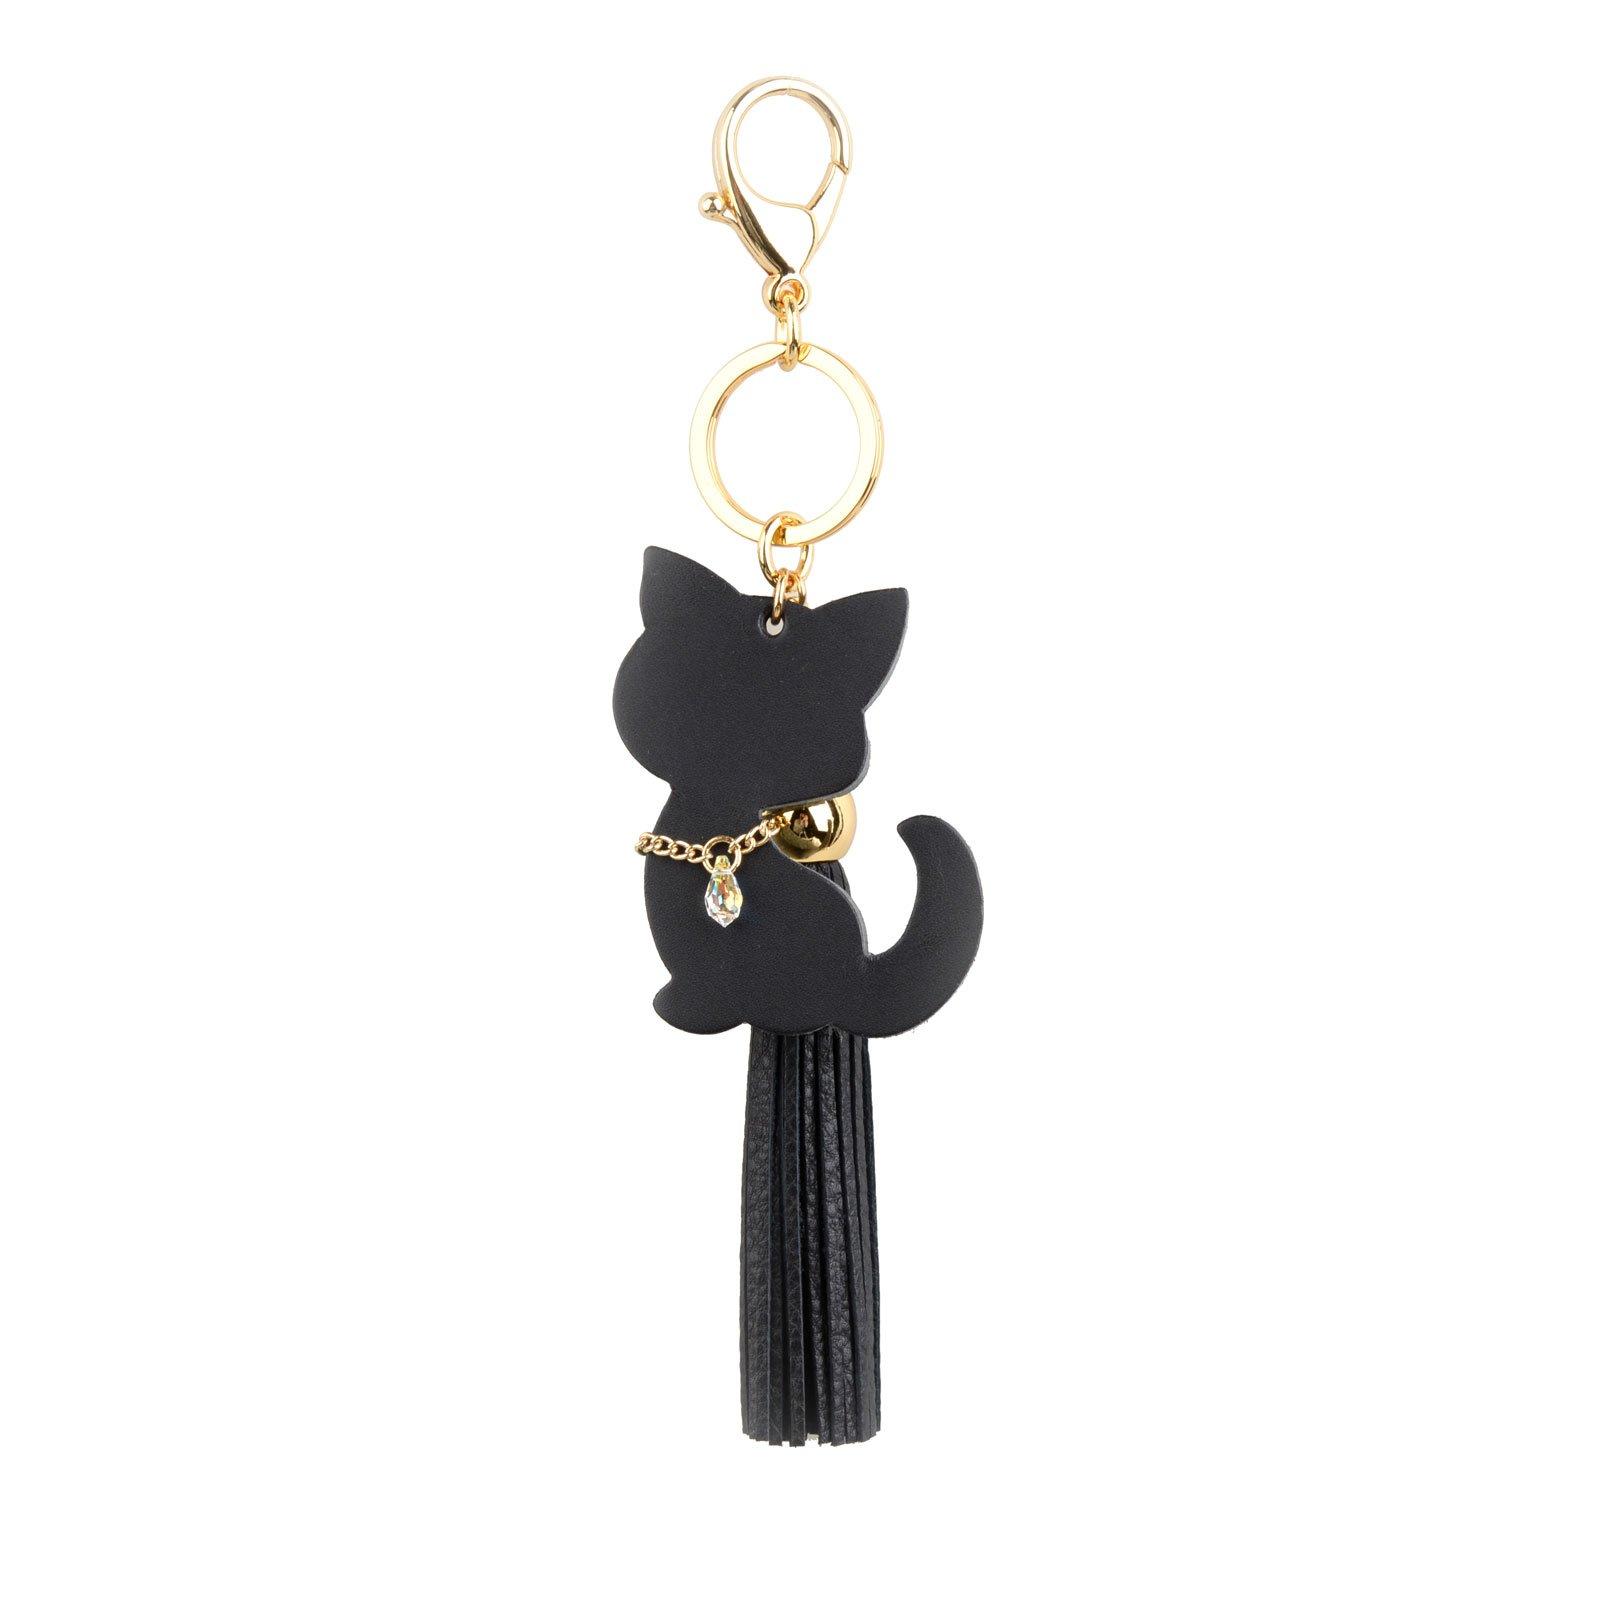 Richbud Cute Black Cat Leather Tassel Keychain Handbag Purse Charm Key Ring (Cat-Crystal-Tassel)